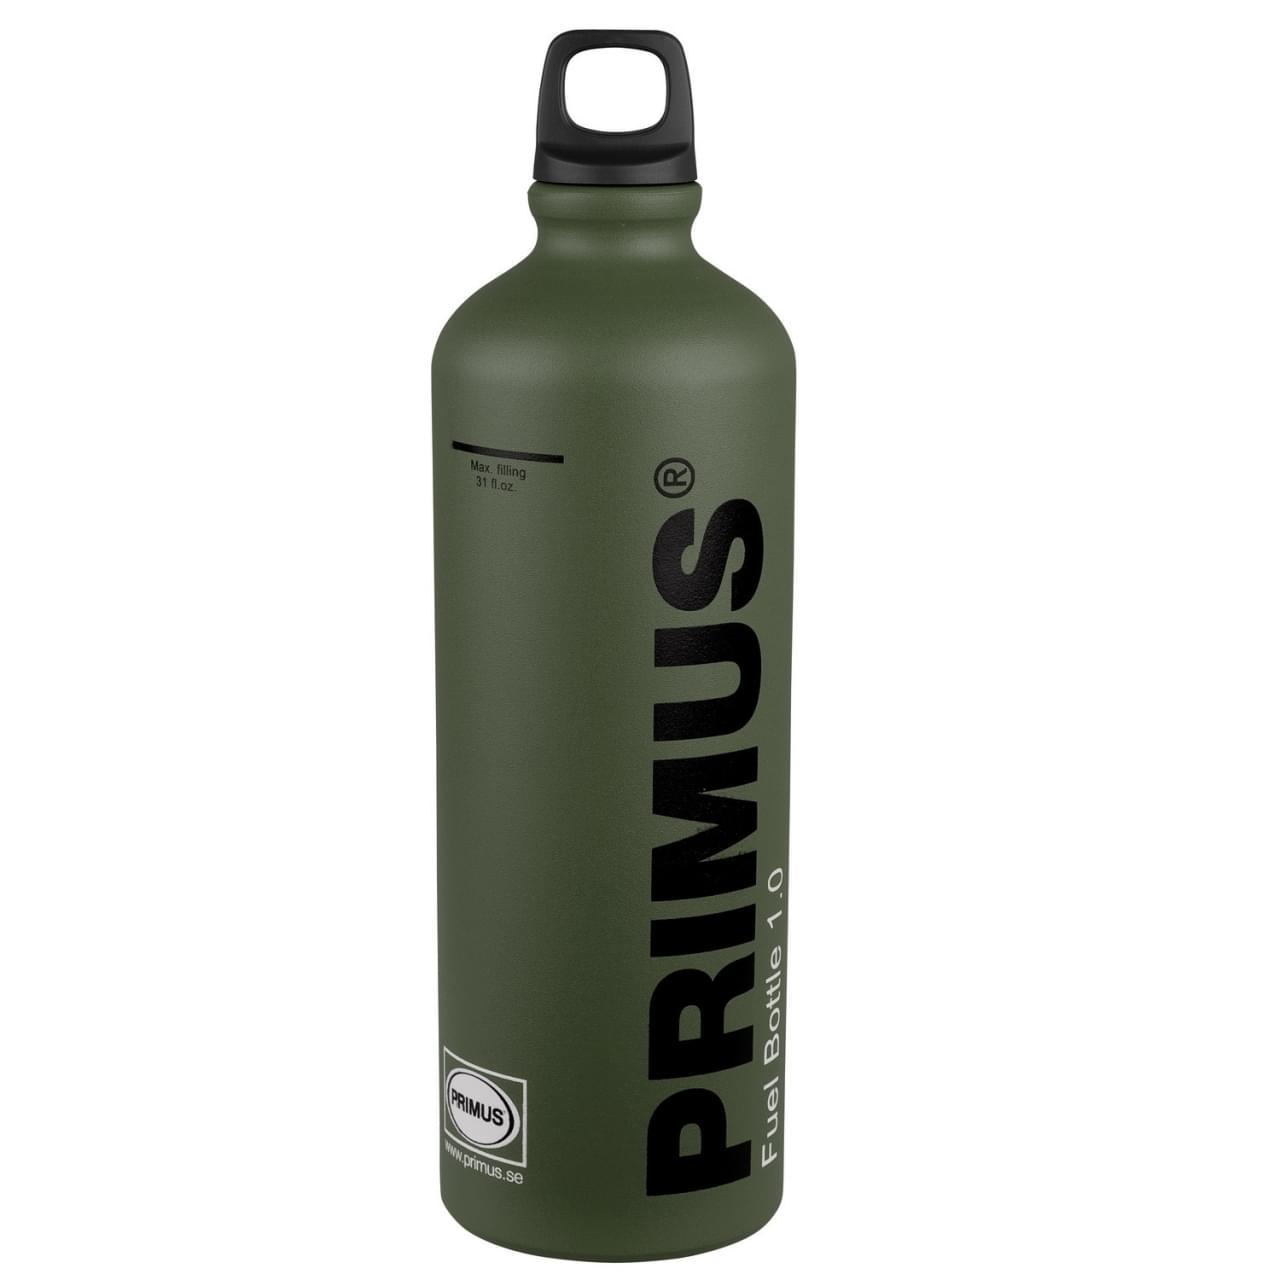 Primus Fuel Bottle 1.0 Brandstoffles